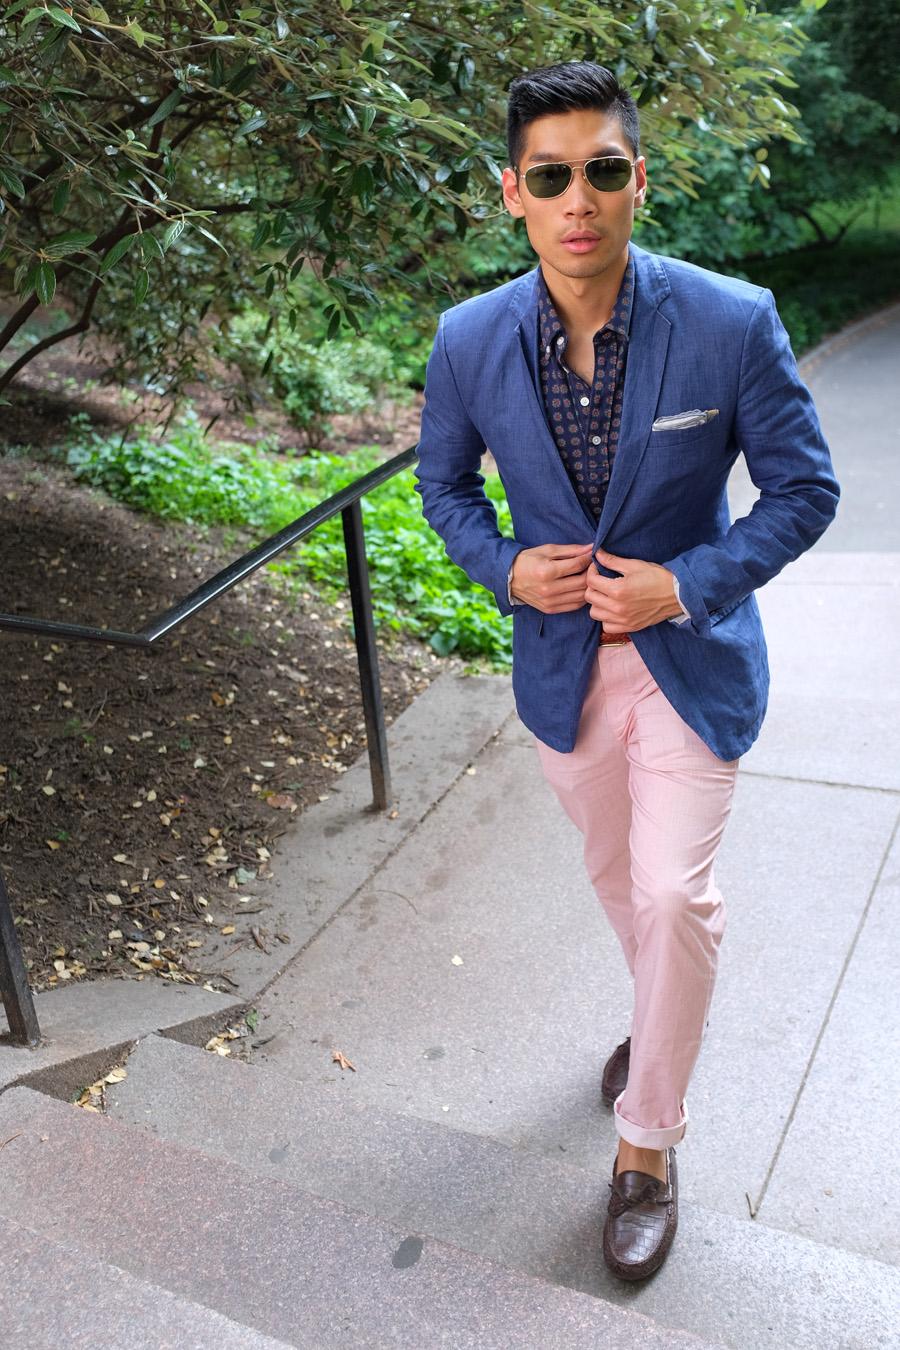 Levitate Style, Sharp Casual, Menswear, Zara, Bonobos, Michael Bastian, Cole